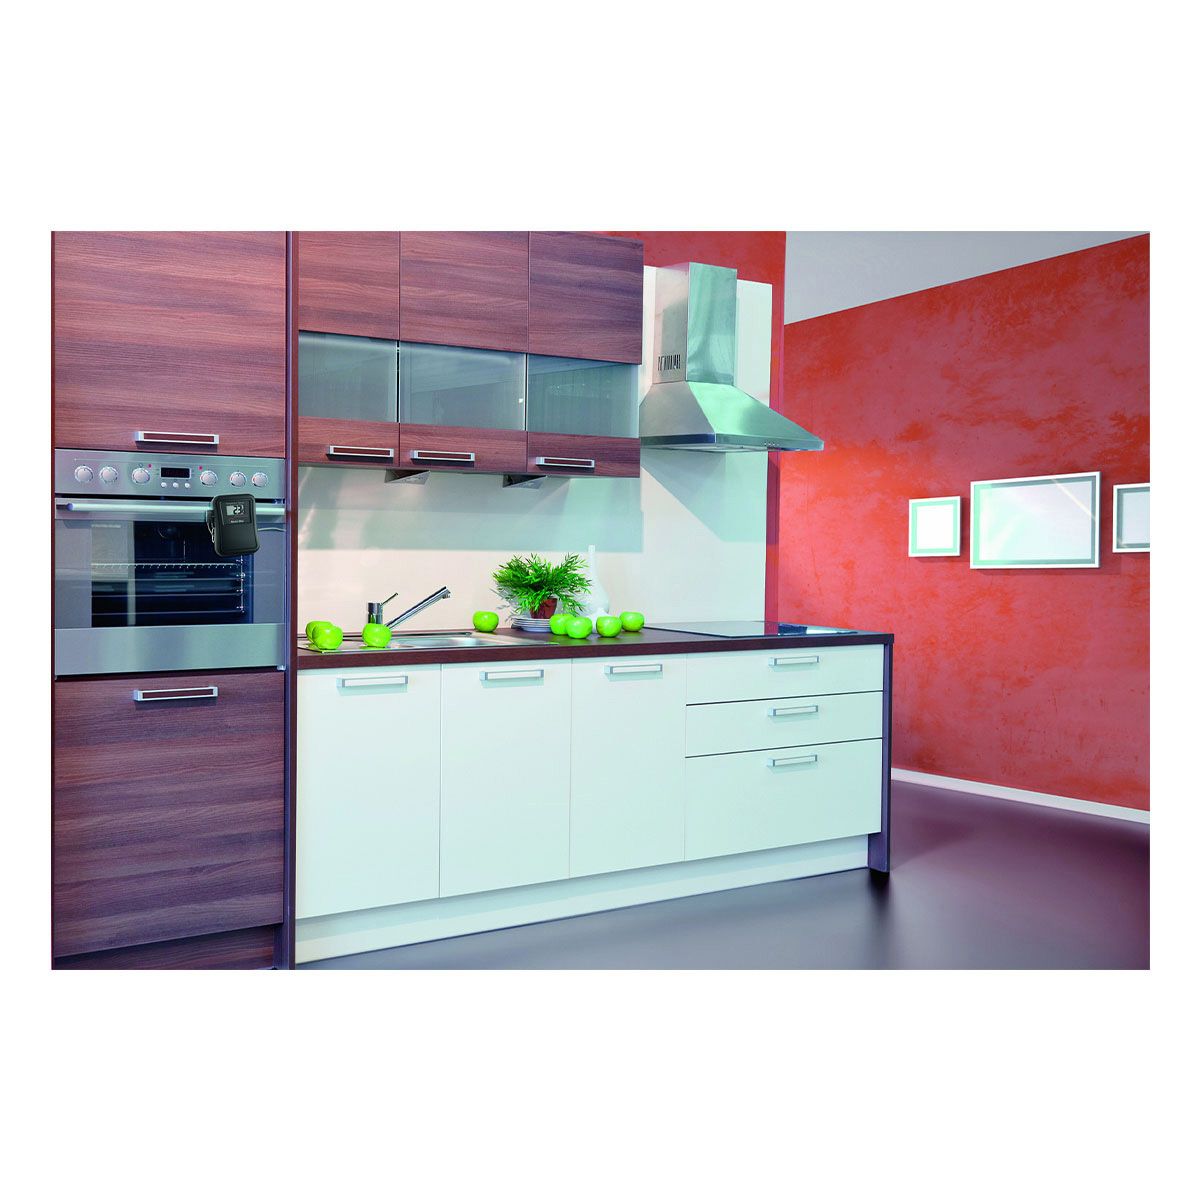 14-1504-funk-grill-bratenthermometer-küchen-chef-anwendung2-1200x1200px.jpg